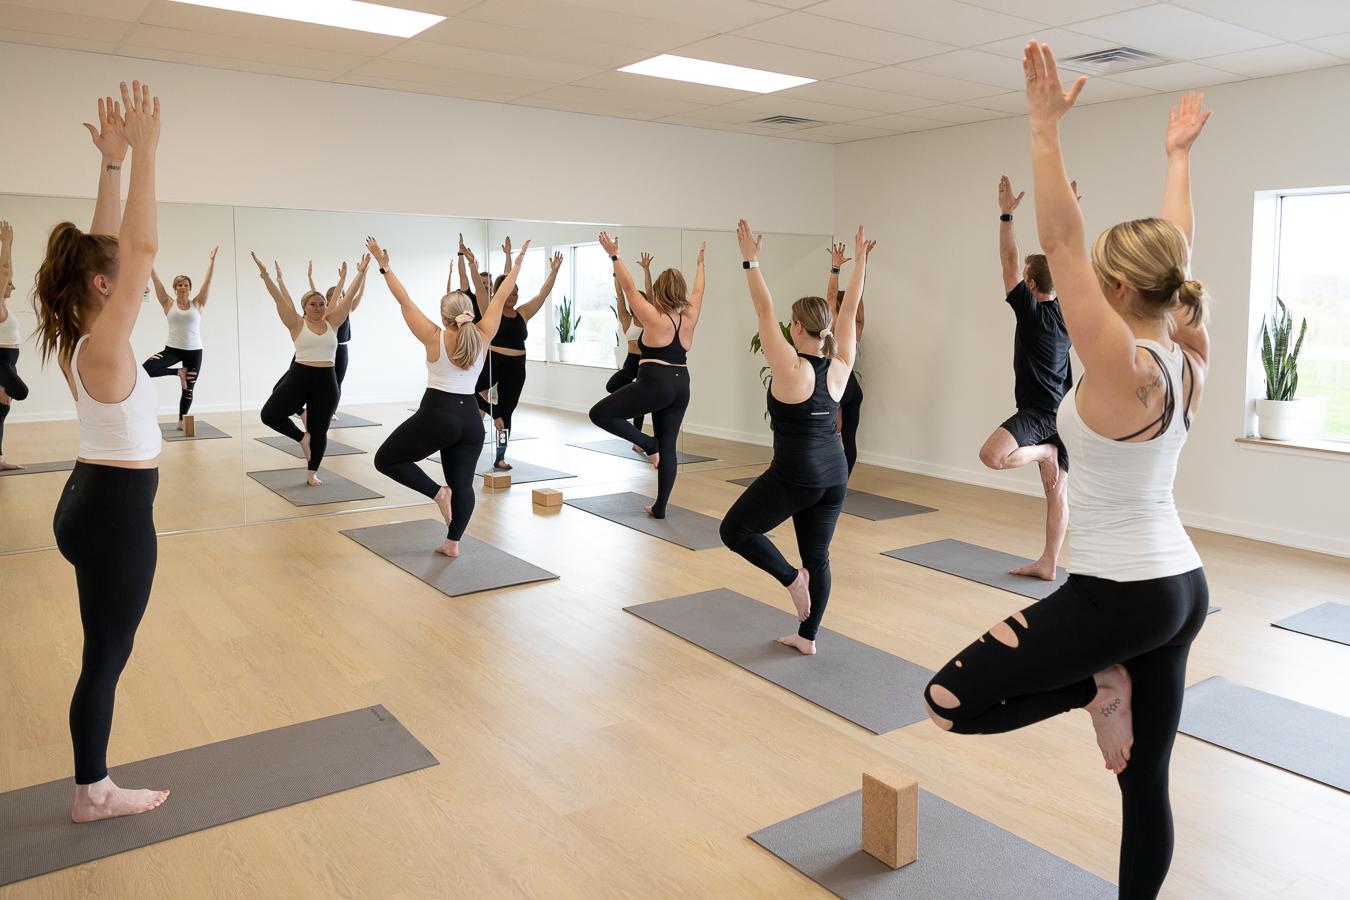 Sweat Shop Hot Yoga Oconomowoc Yoga Group Class 12